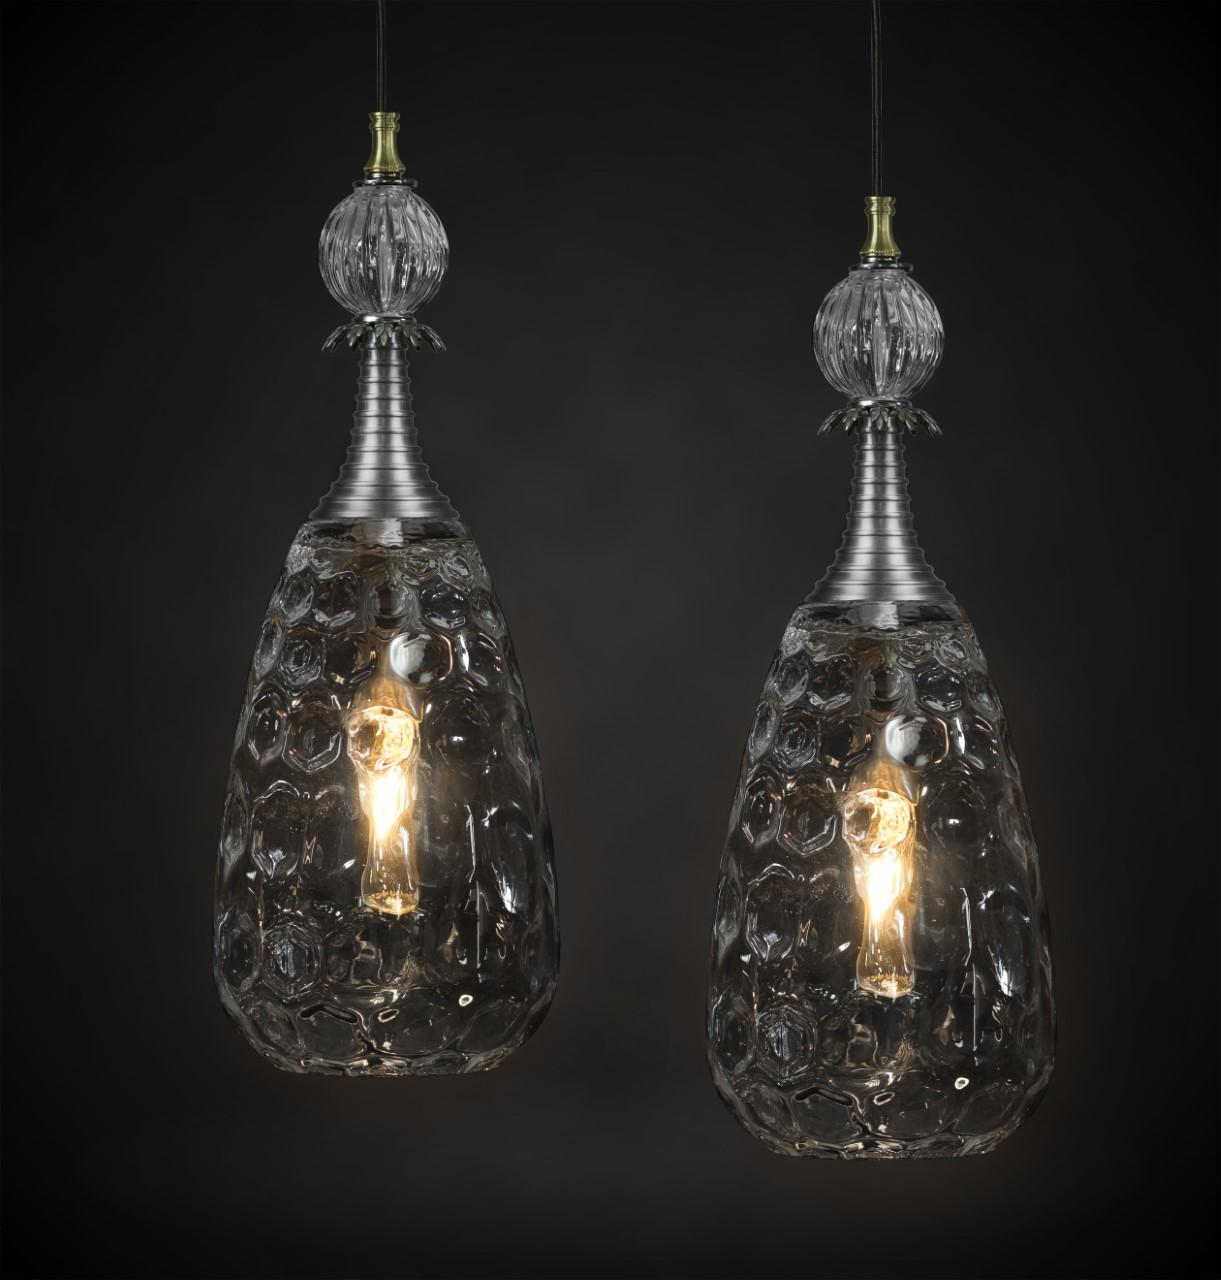 Luna Bella Oberon Pendant Light Supplier And Dealer